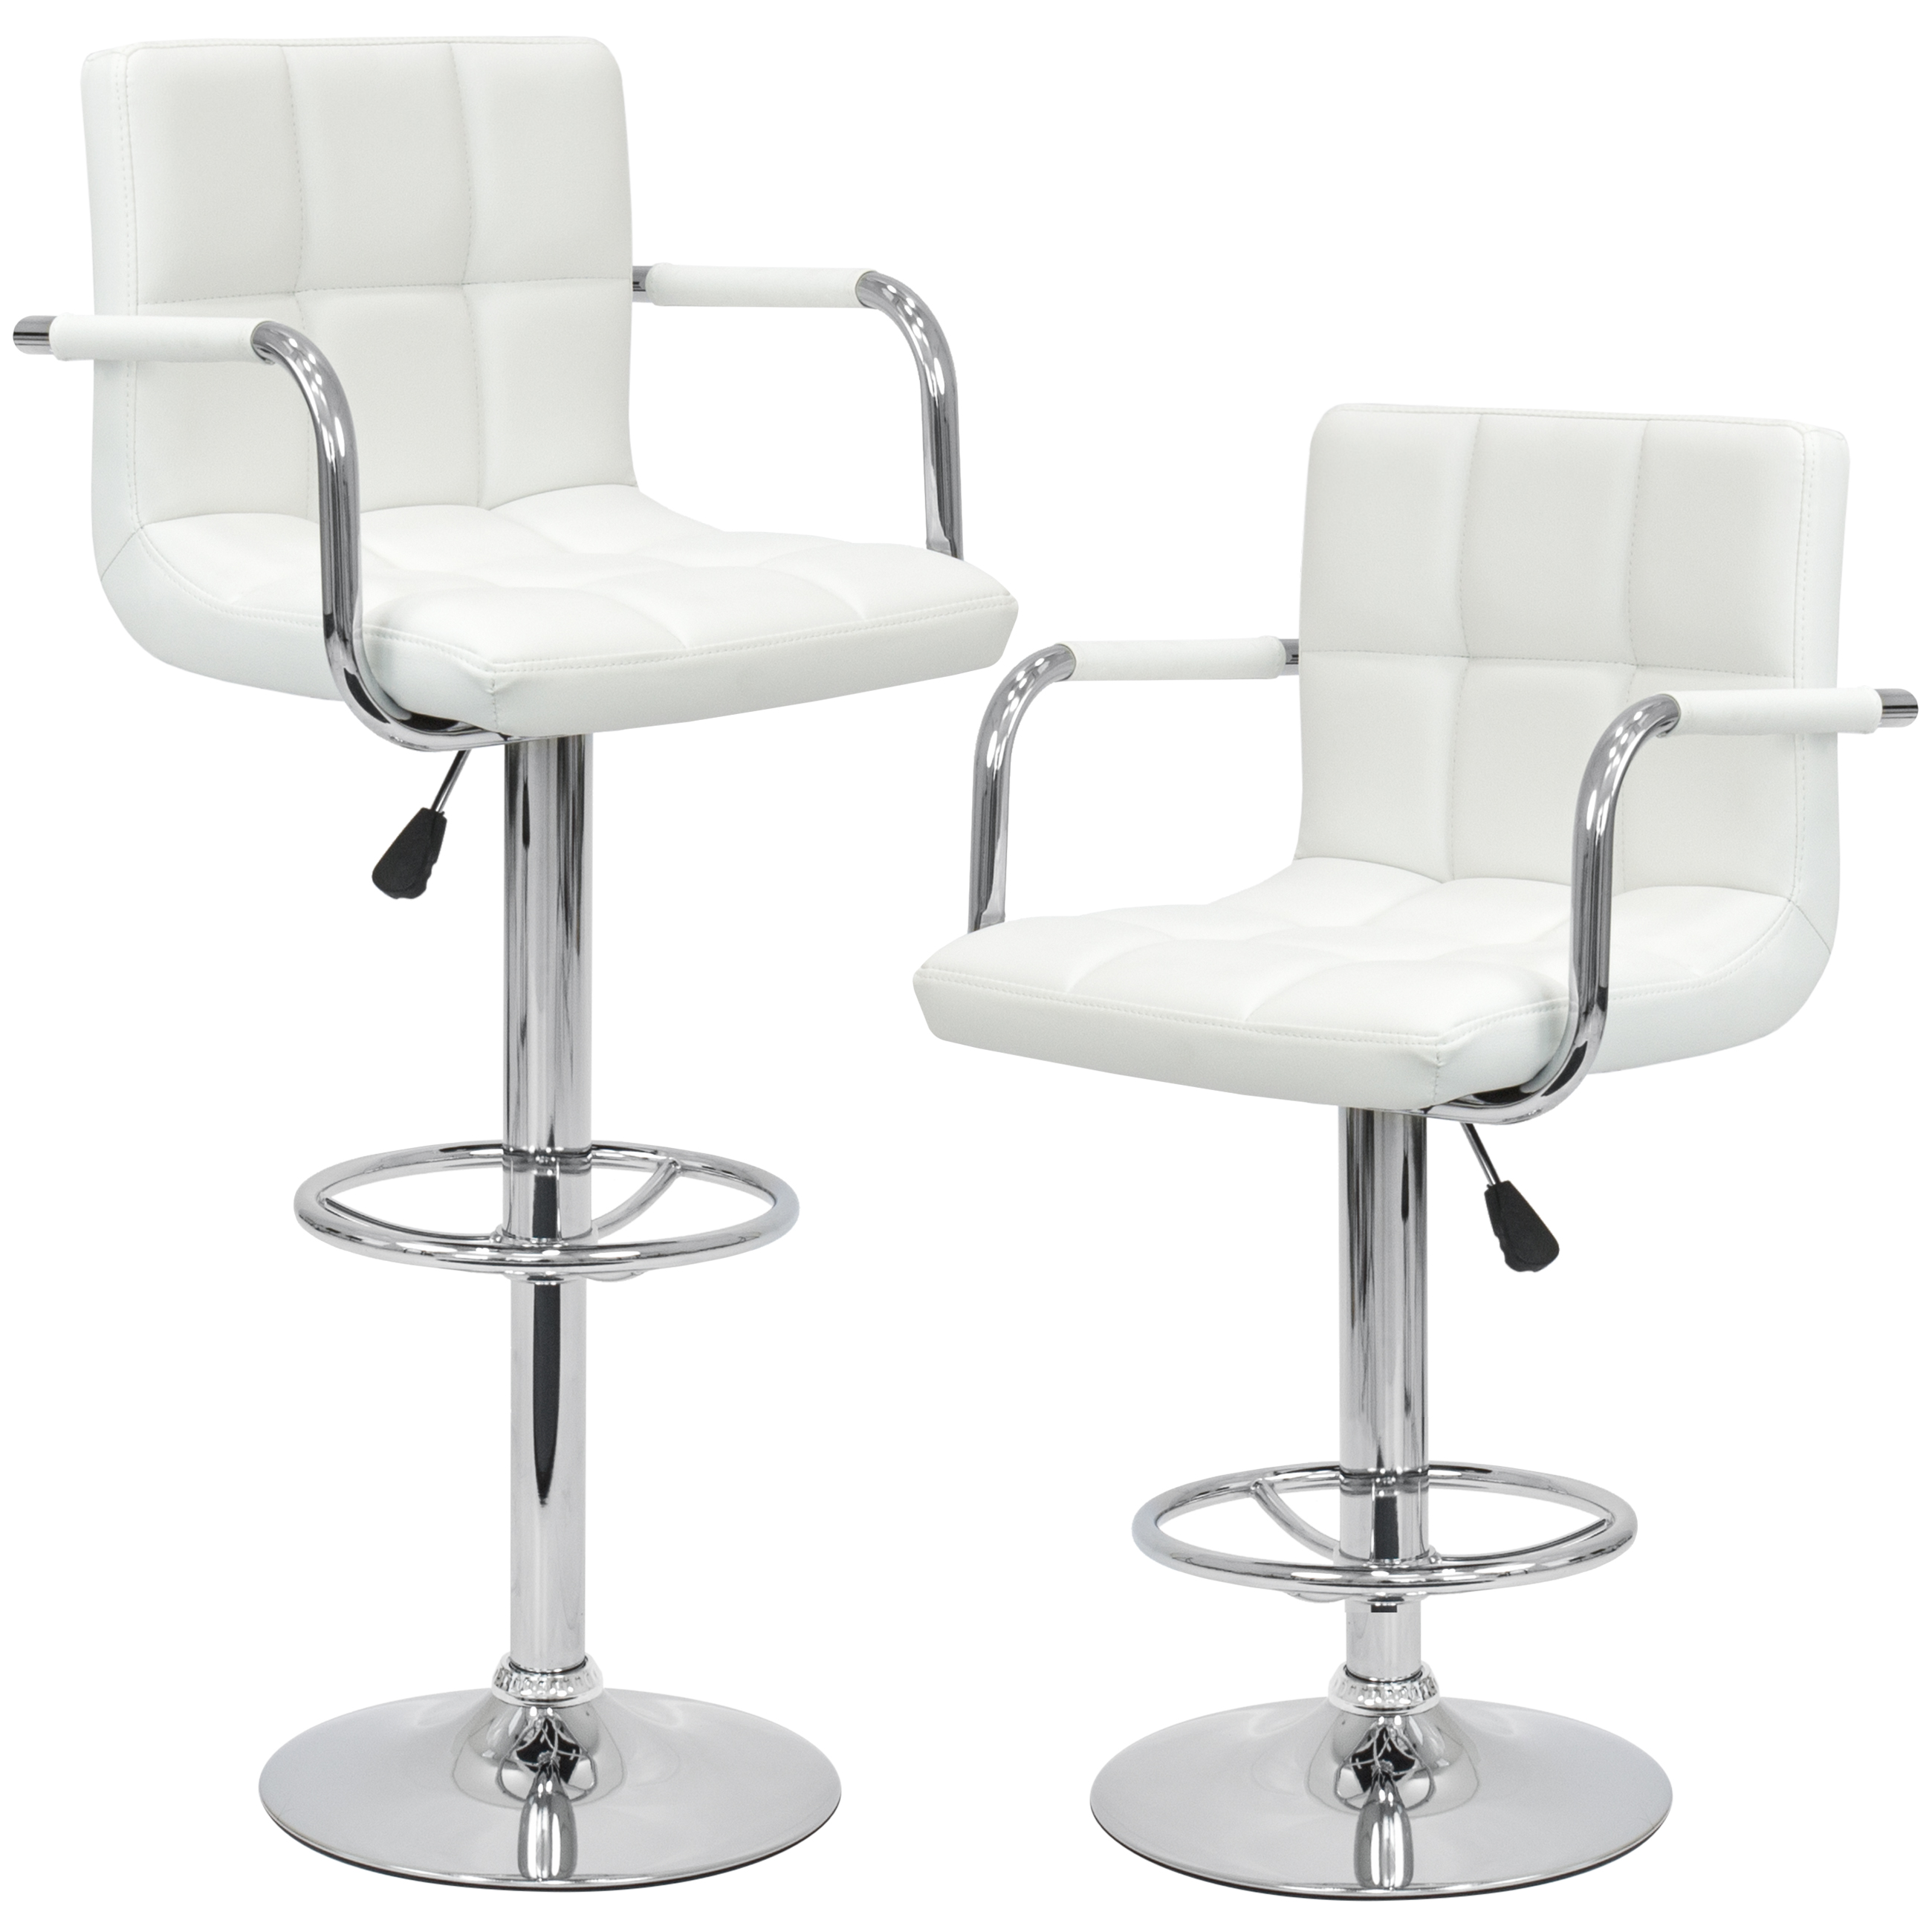 Bar Stool Set Of 2 Adjustable Height Seat Chair Swivel: Set Of 2 Swivel Hydraulic Height Adjustable Leather Pub